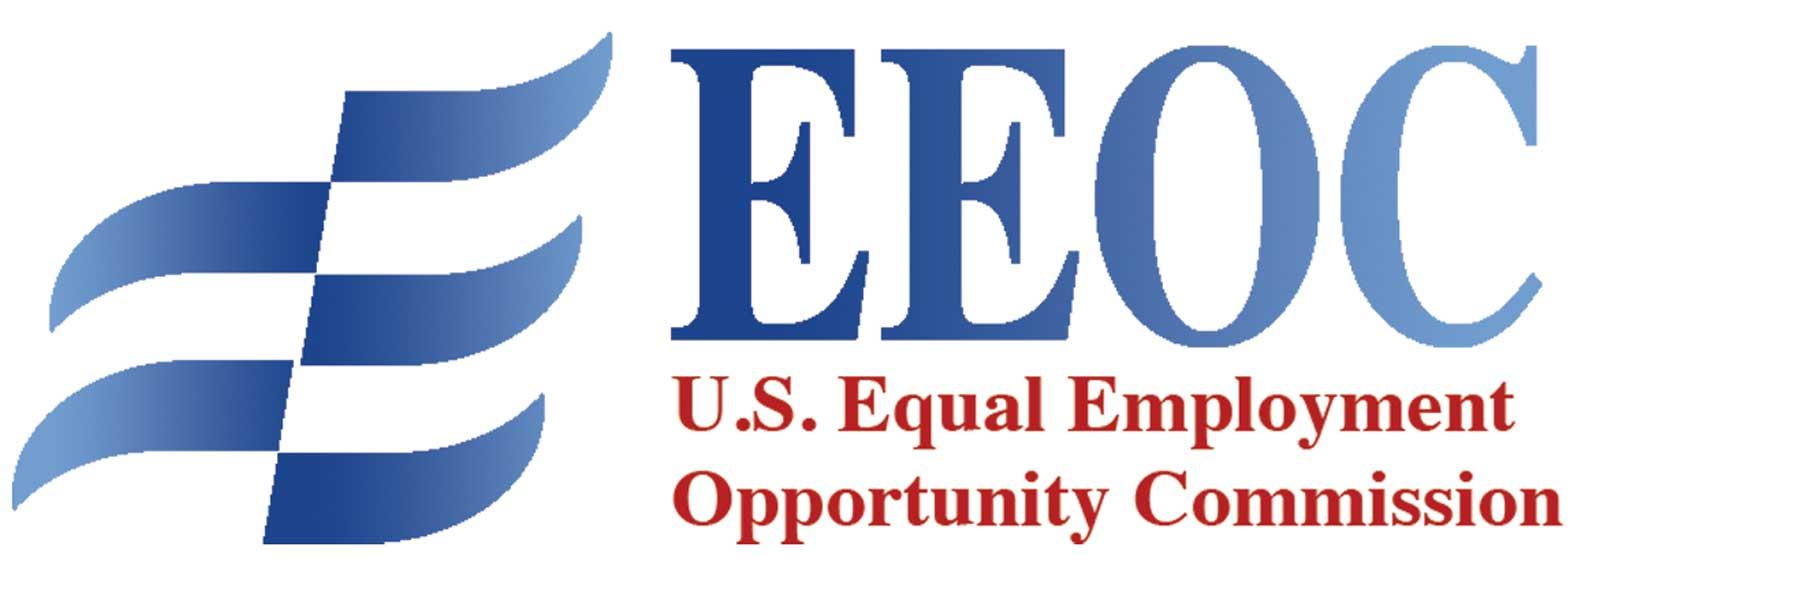 eeoc application